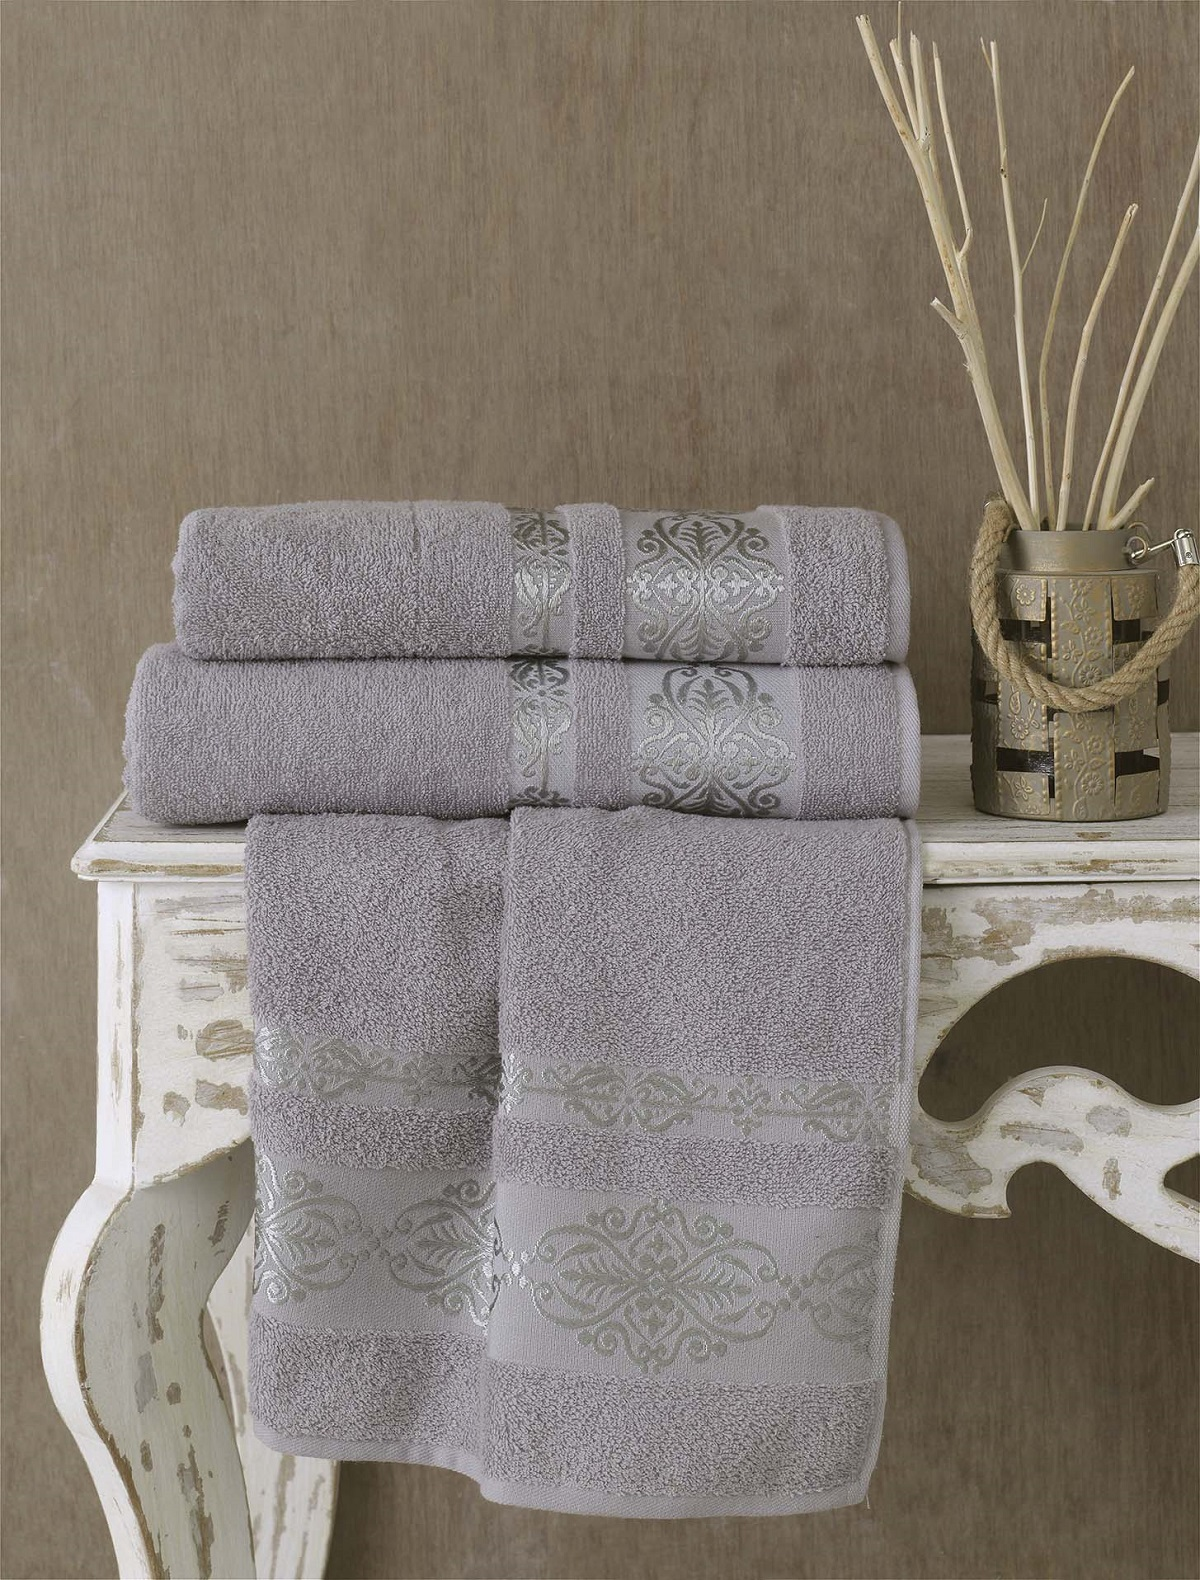 Полотенца Karna Полотенце Rebeka Цвет: Серый (70х140 см) karna karna полотенце innes цвет красный 70х140 см